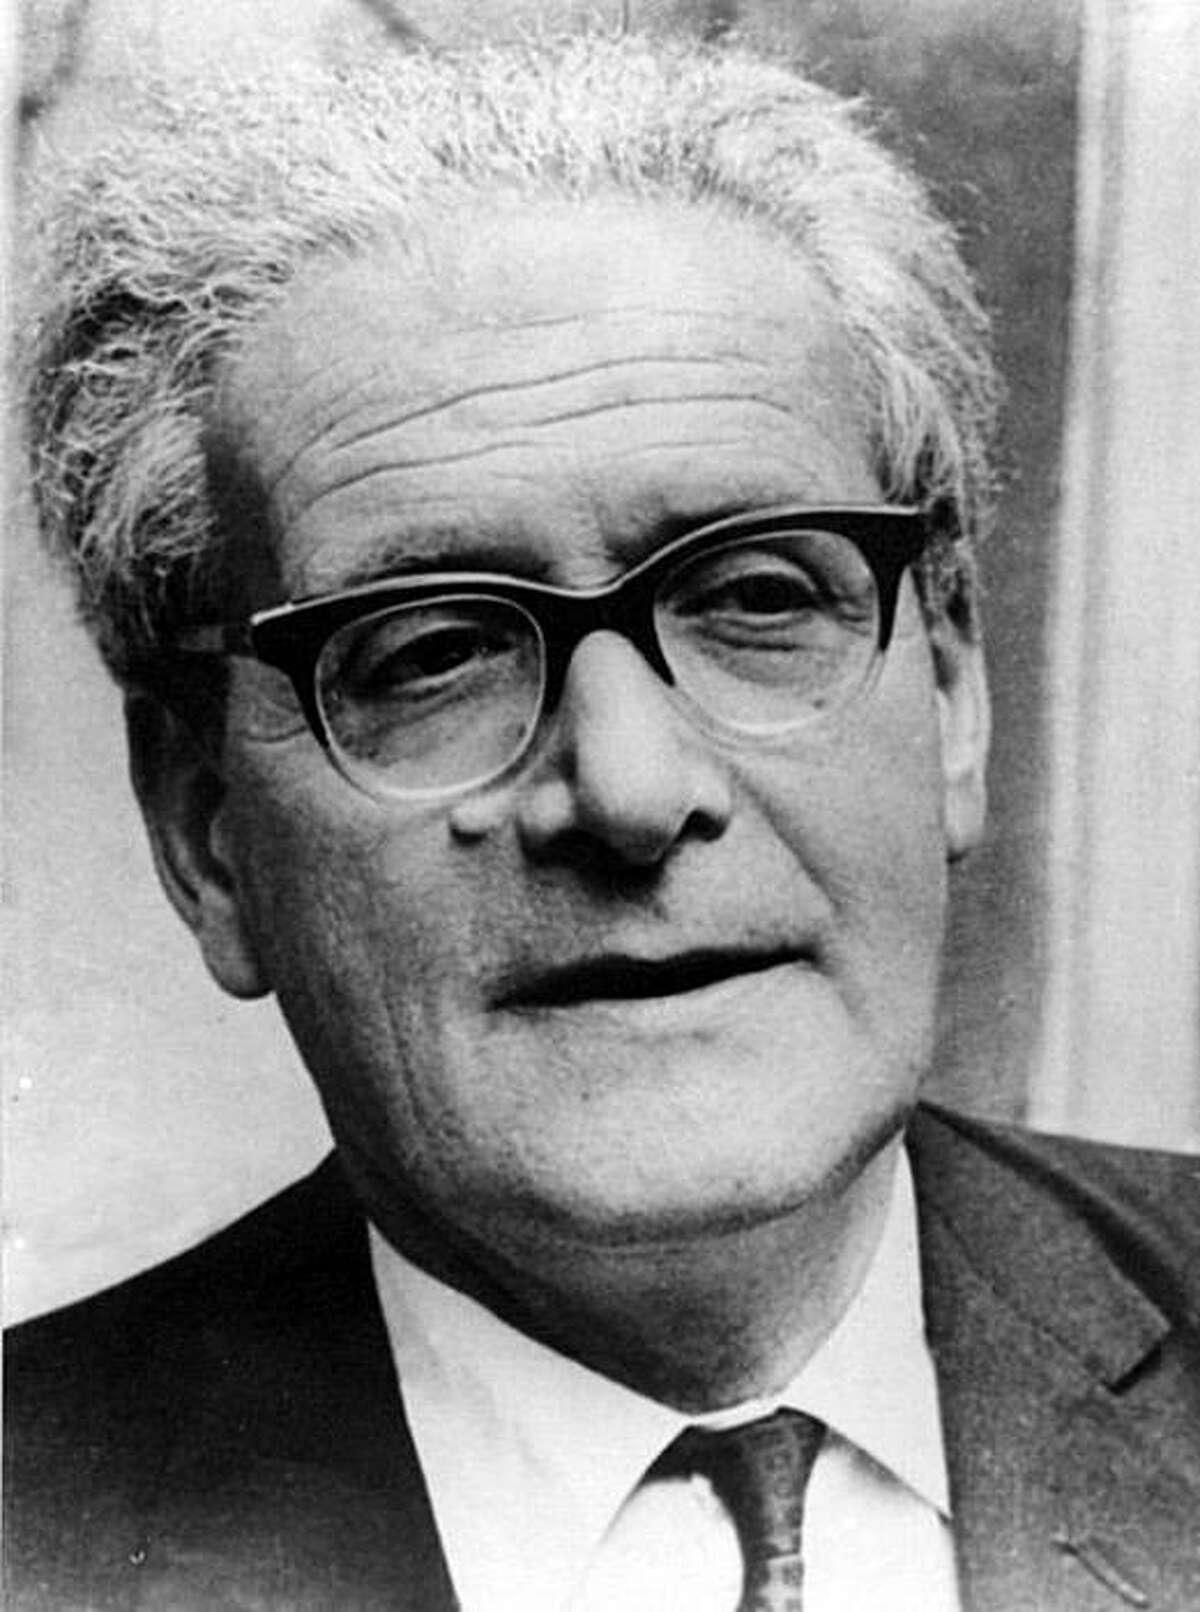 H.G. Adler, author